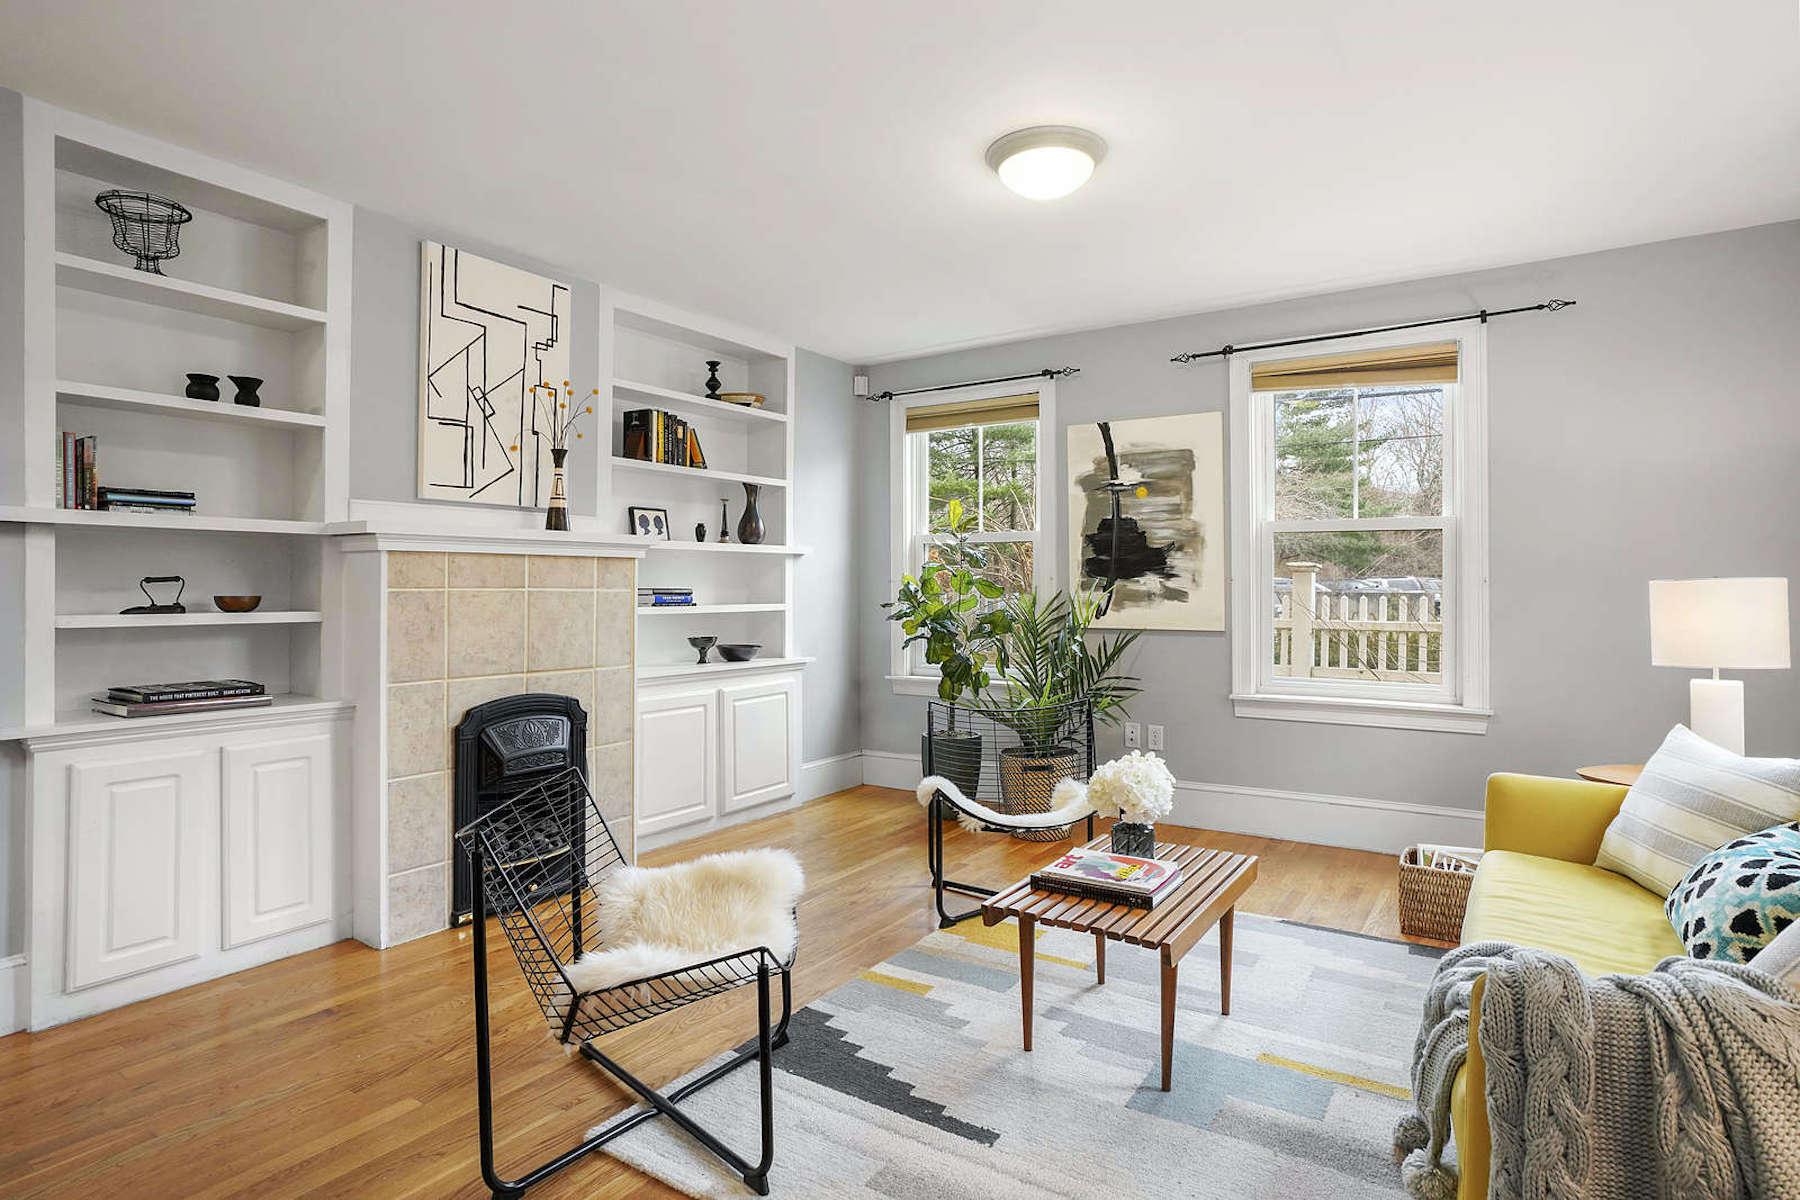 Condominiums for Sale at 97 Mystic Street, Unit 97 97 Mystic Street Unit 97 Arlington, Massachusetts 02474 United States